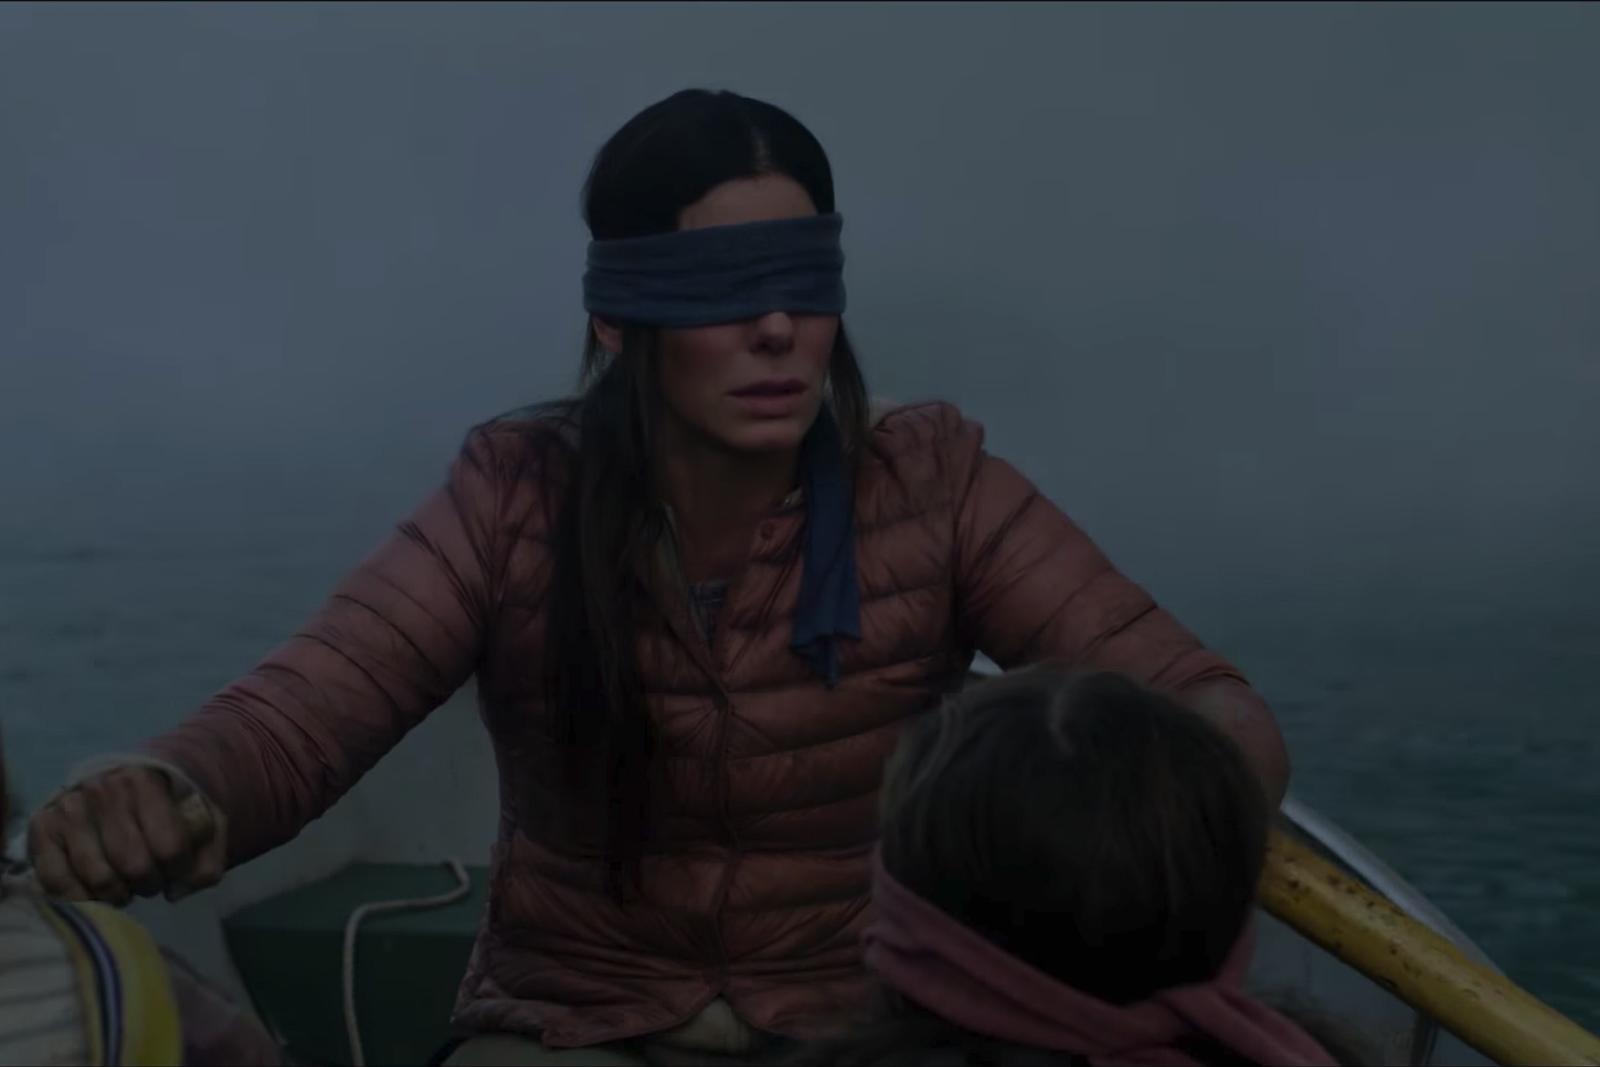 Sandra Bullock Fights An Evil Force In Freaky Bird Box Trailer